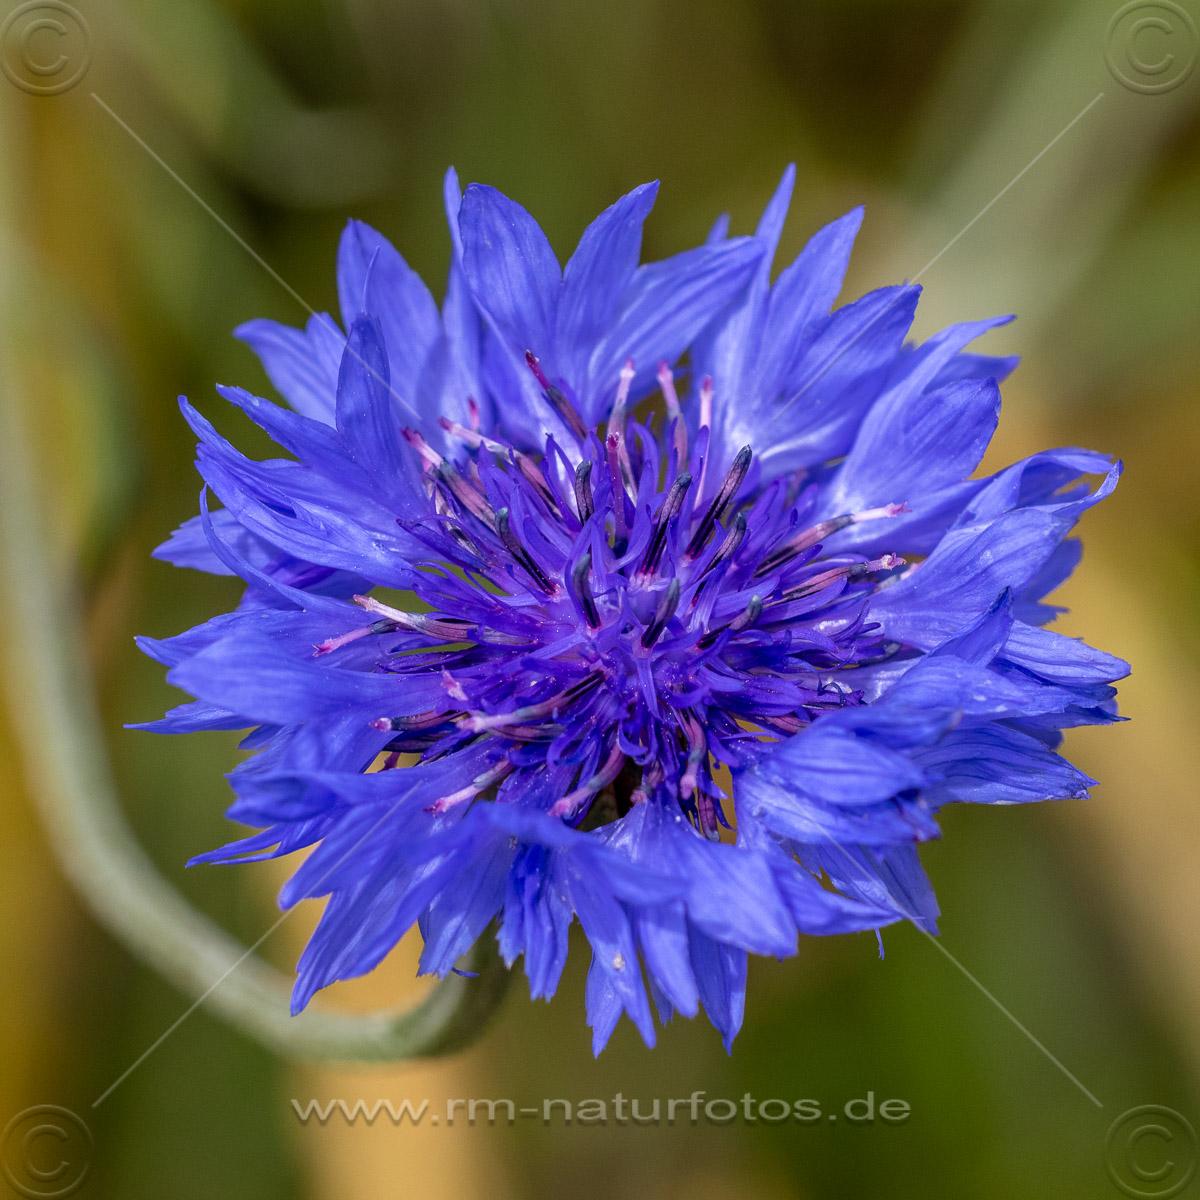 Kornnblume (Centaurea cyanus)